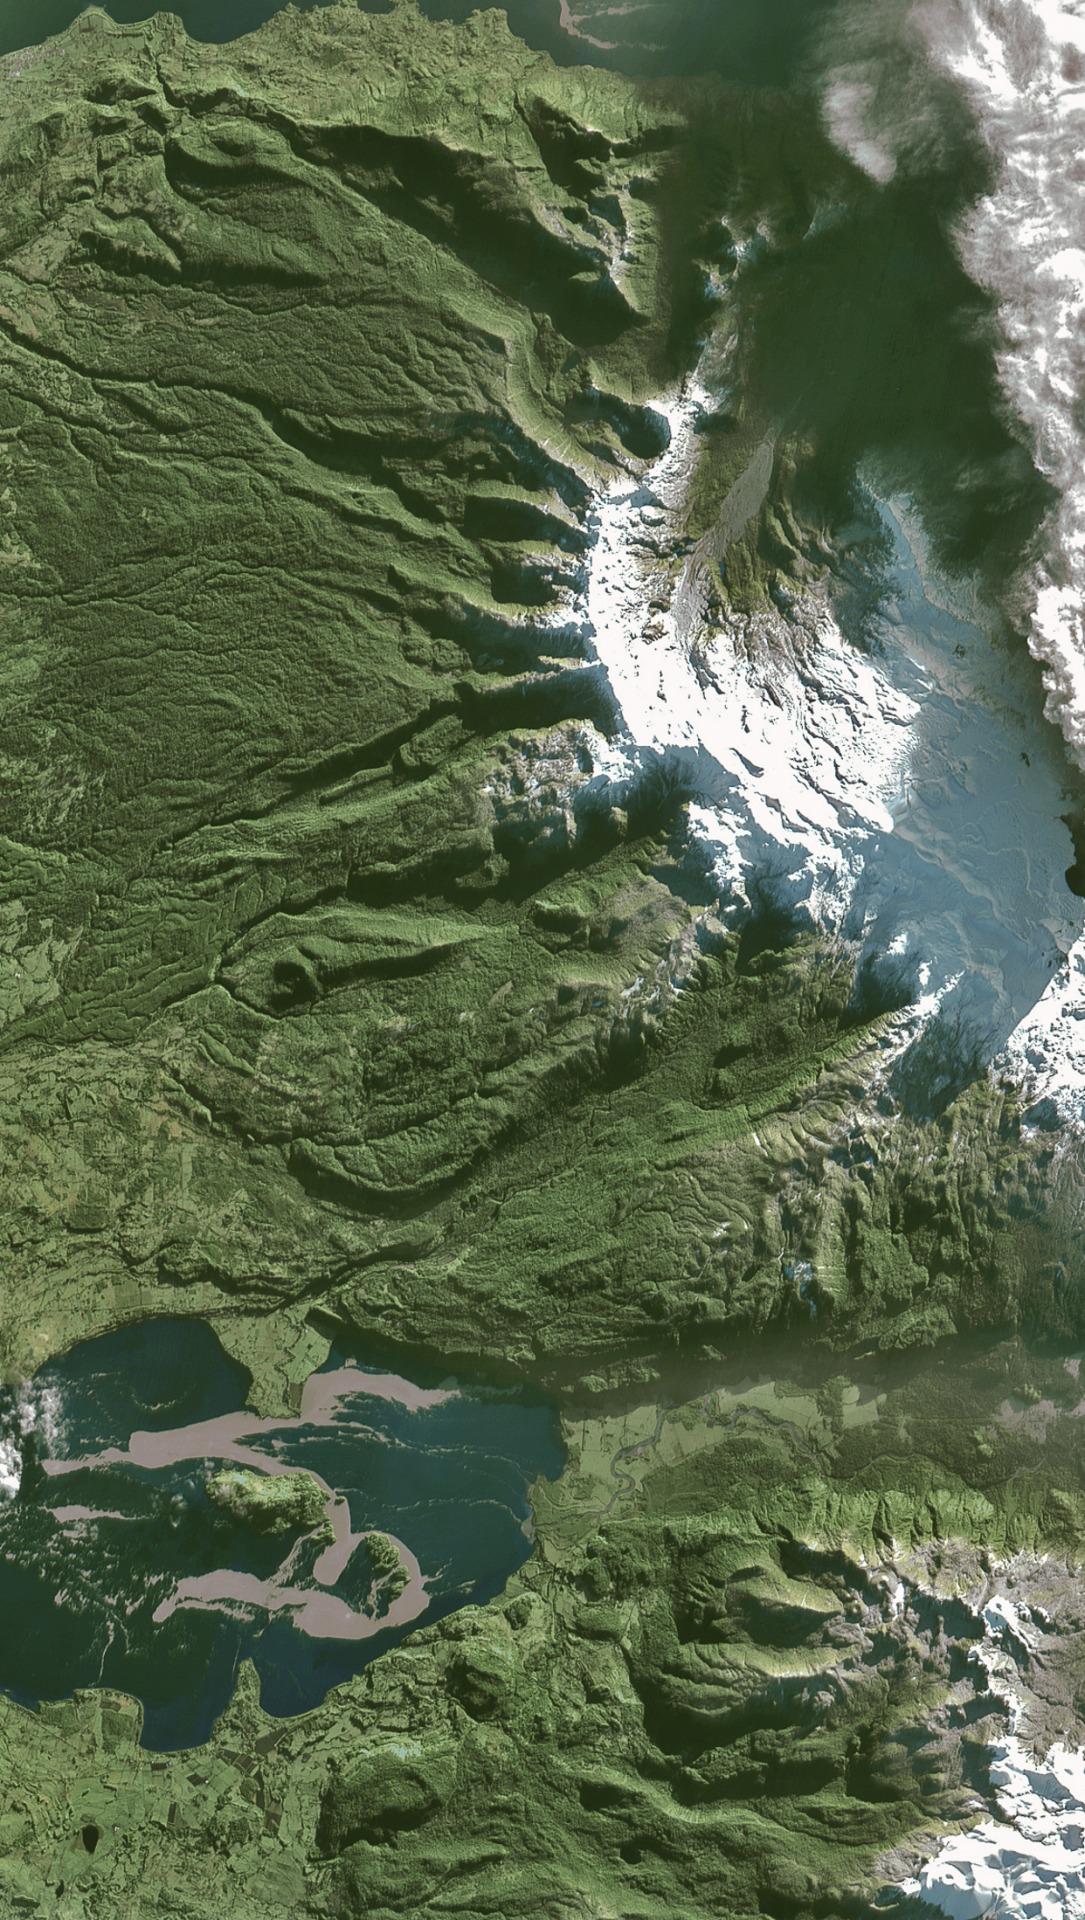 Airbus Iphone Wallpaper Aerial Wallpapers Satellite Wallpaper For Your Phone